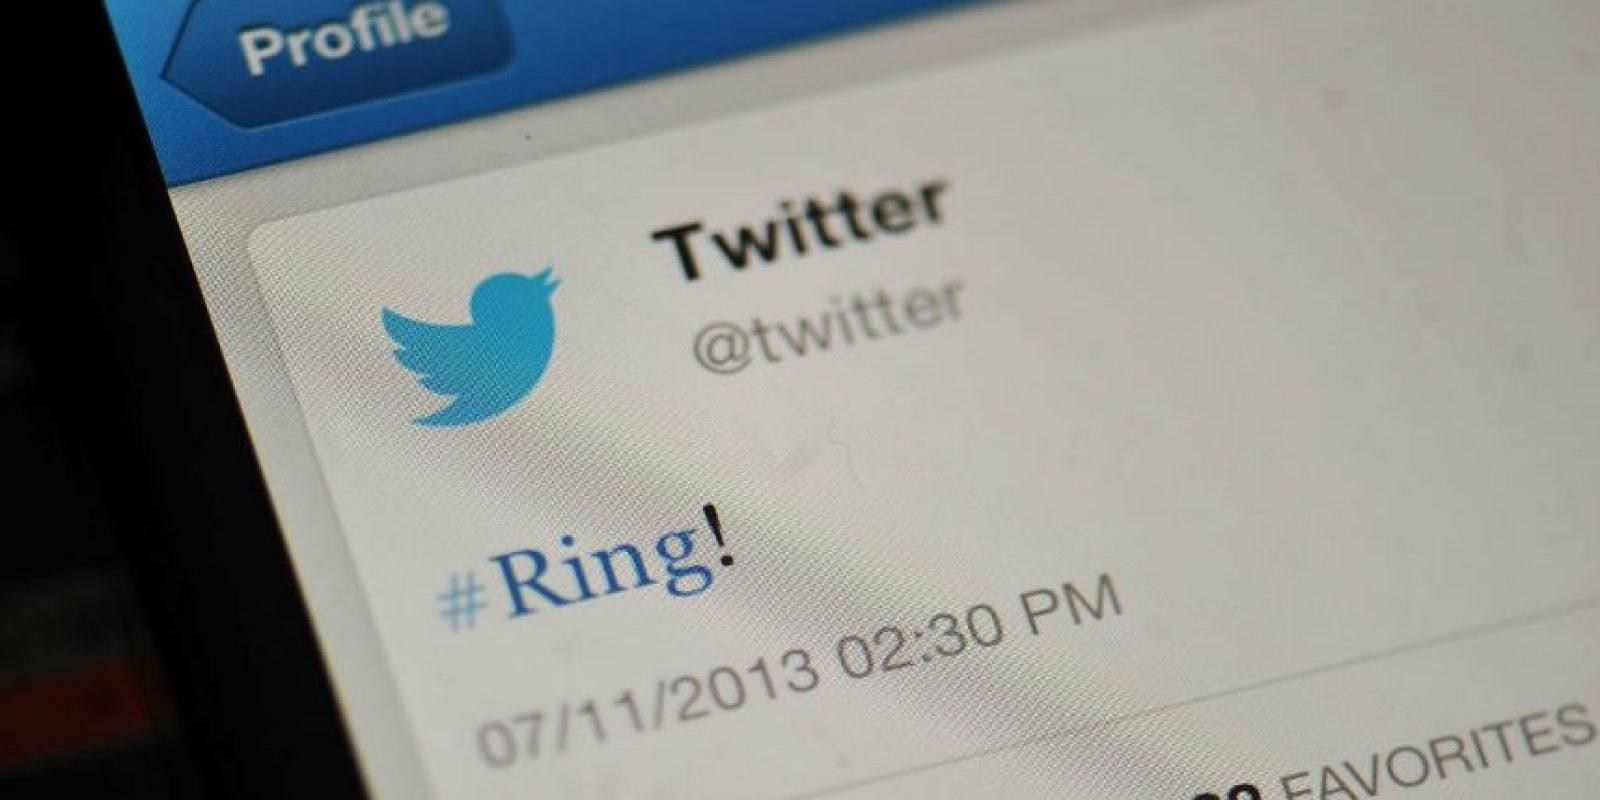 Esto ha caracterizado a la red social. Foto:Getty Images